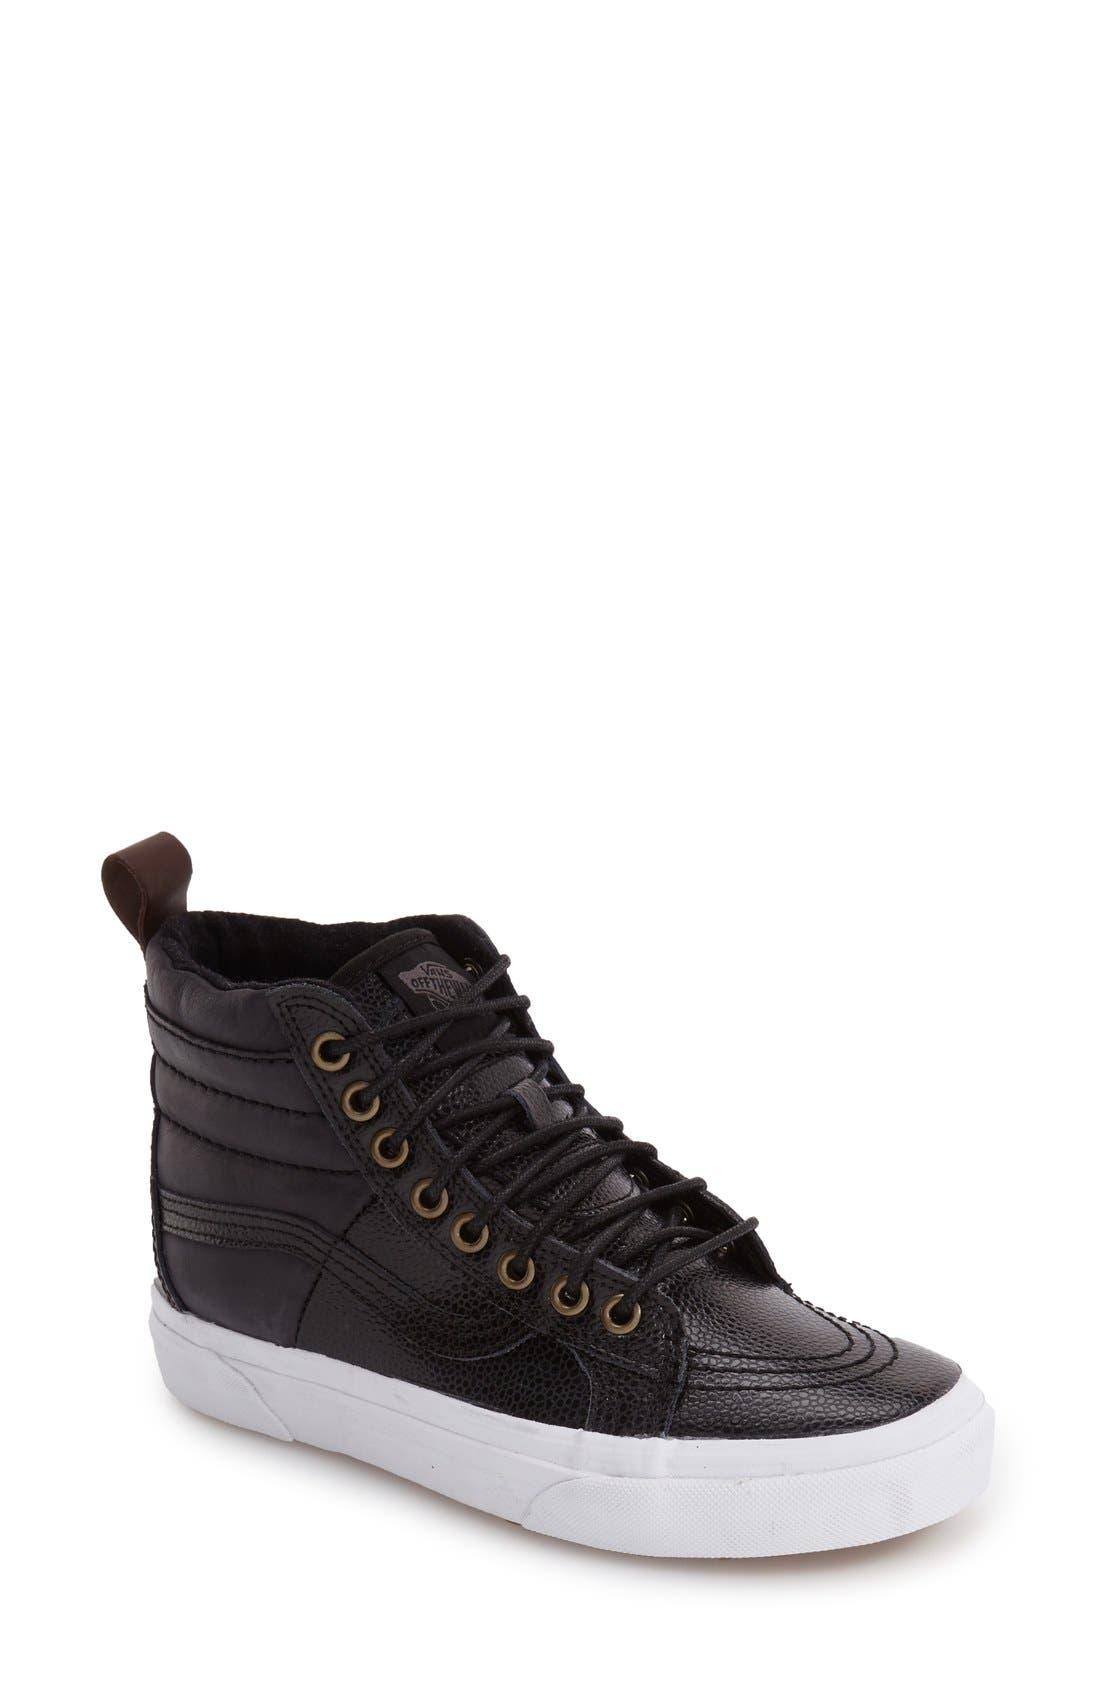 VANS Hana Beaman - Sk8-Hi 46 MTE Water Resistant High Top Sneaker